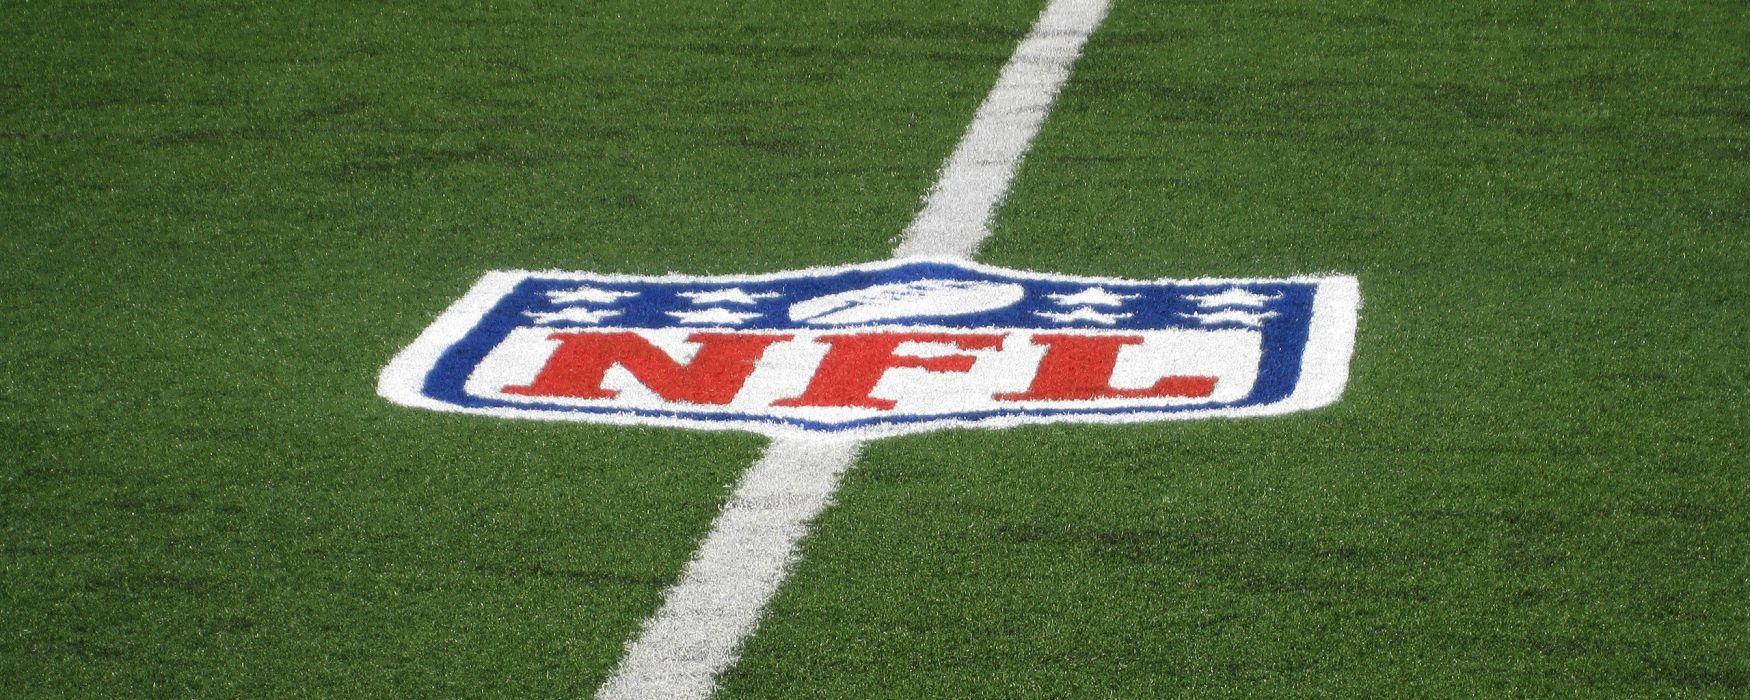 duel NFL wallpaper